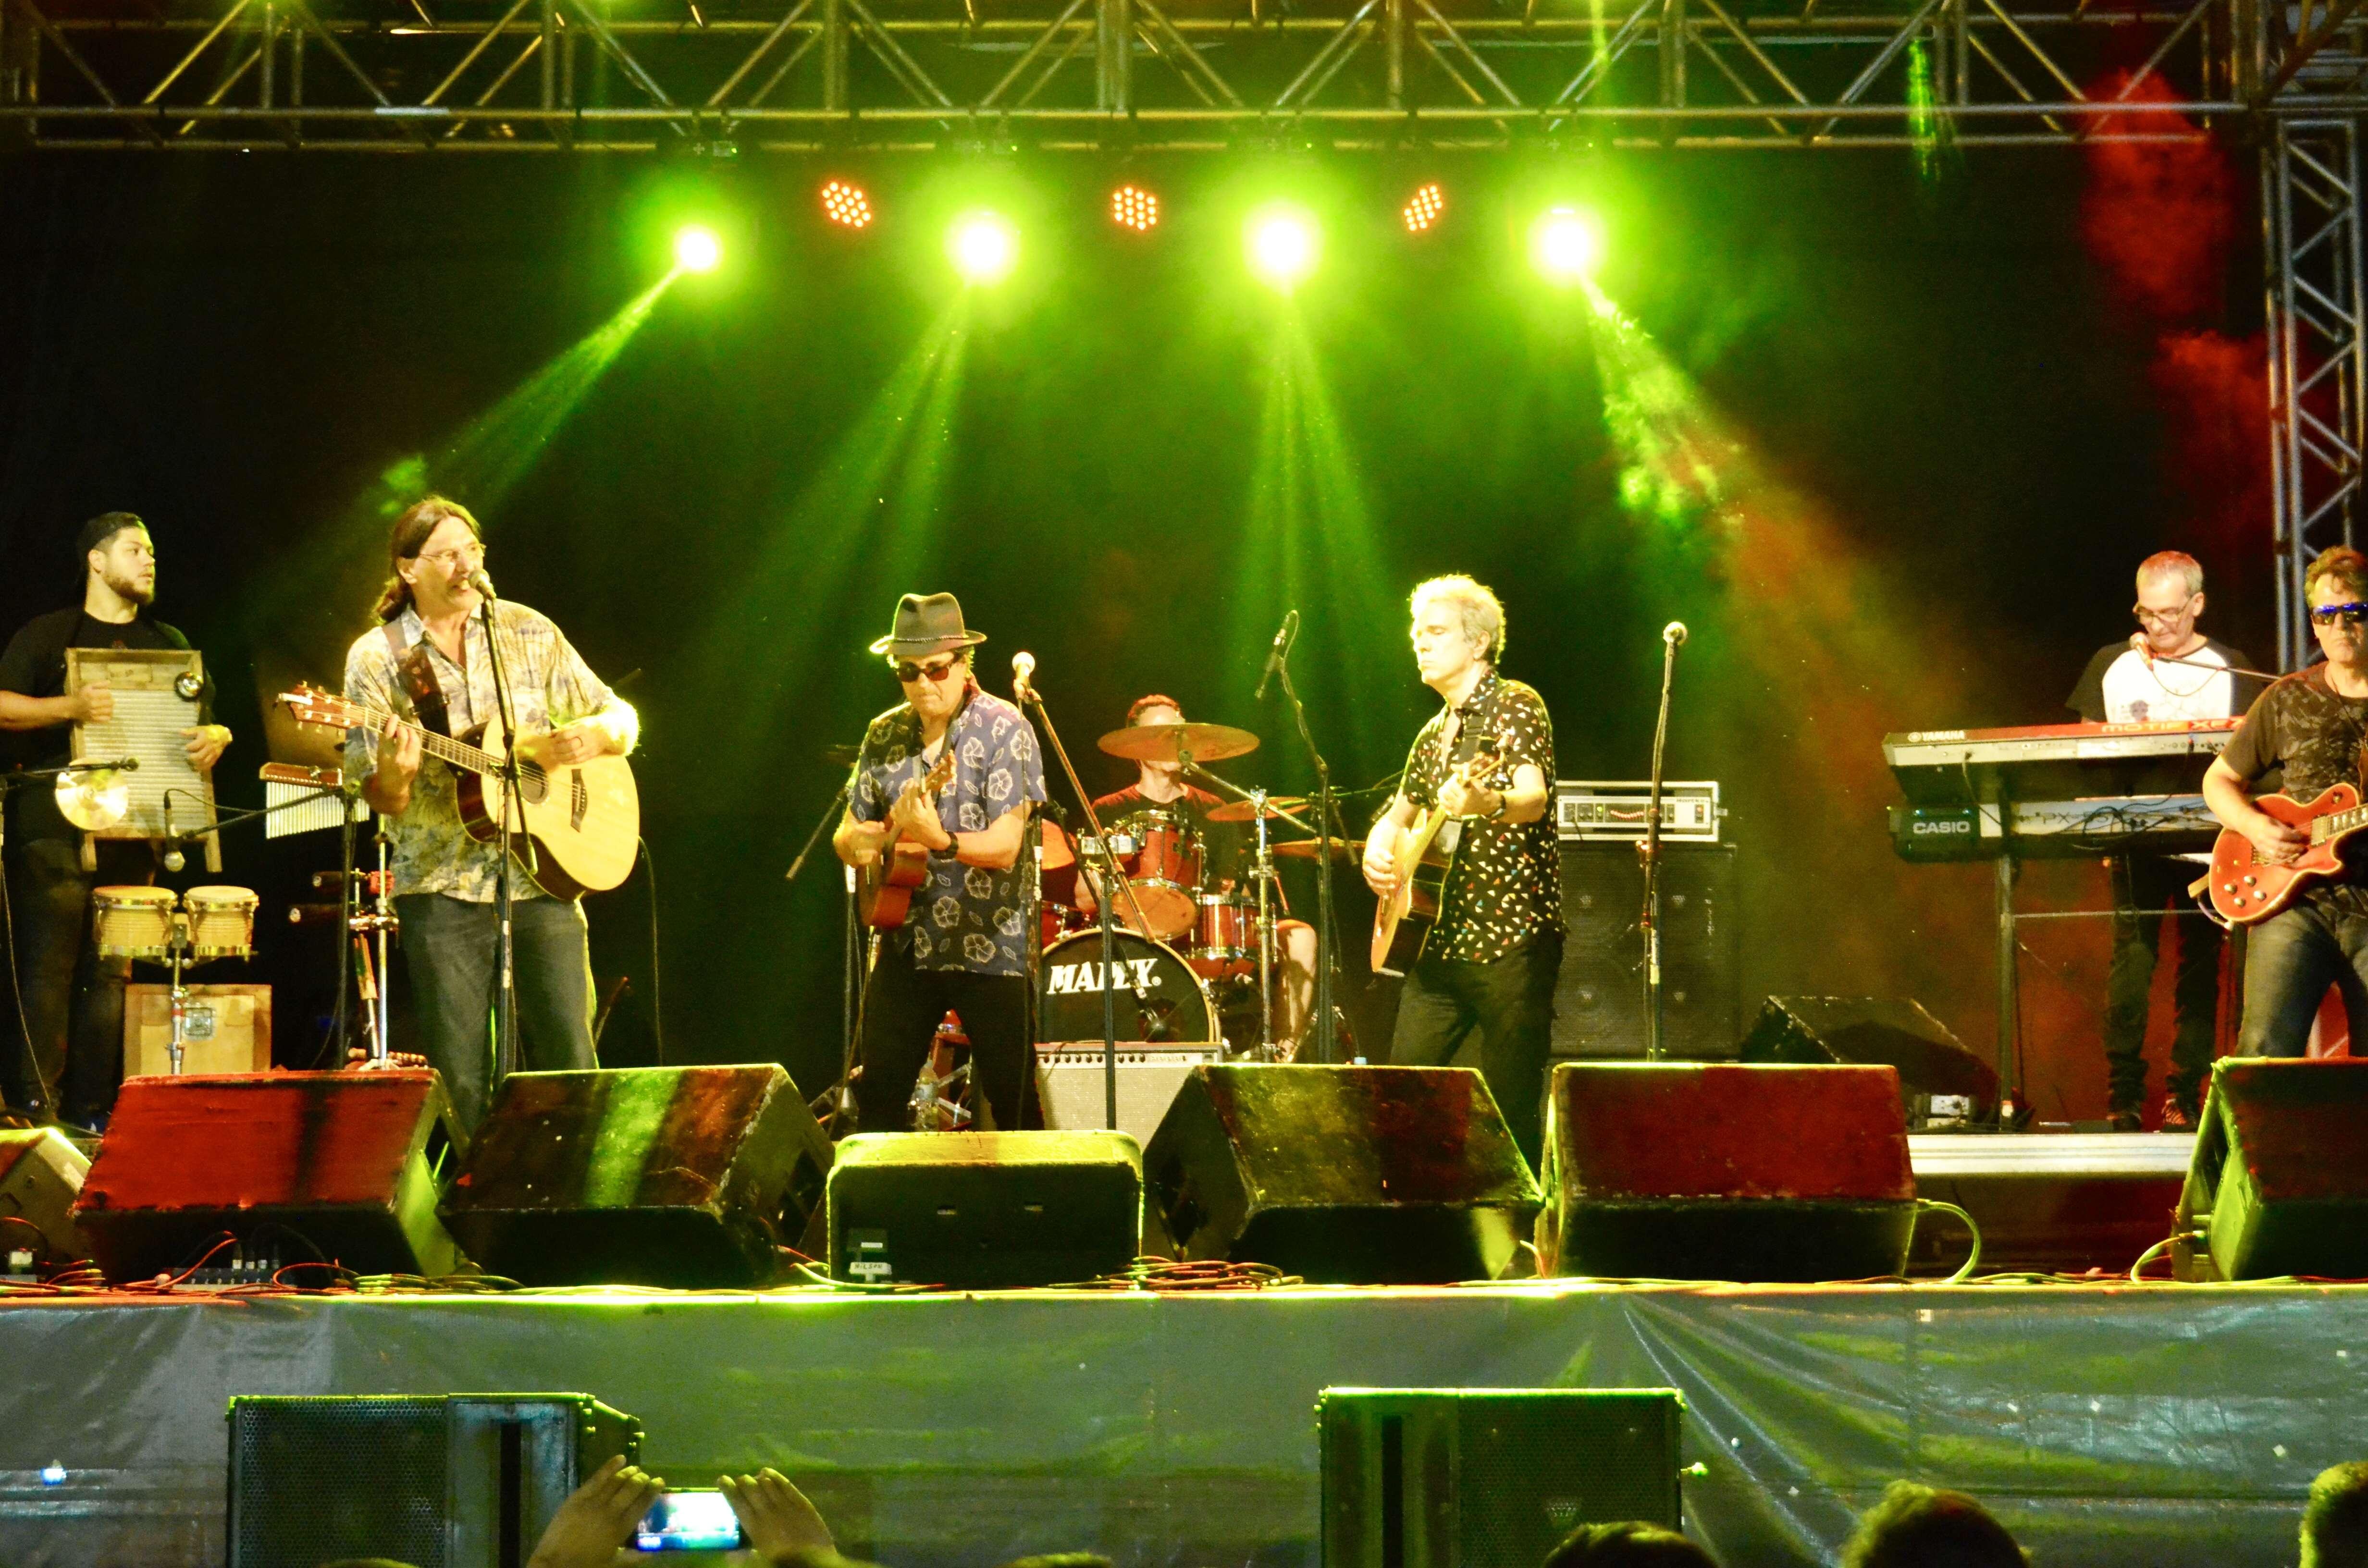 Evandro Mesquita e a banda The Fab Tab